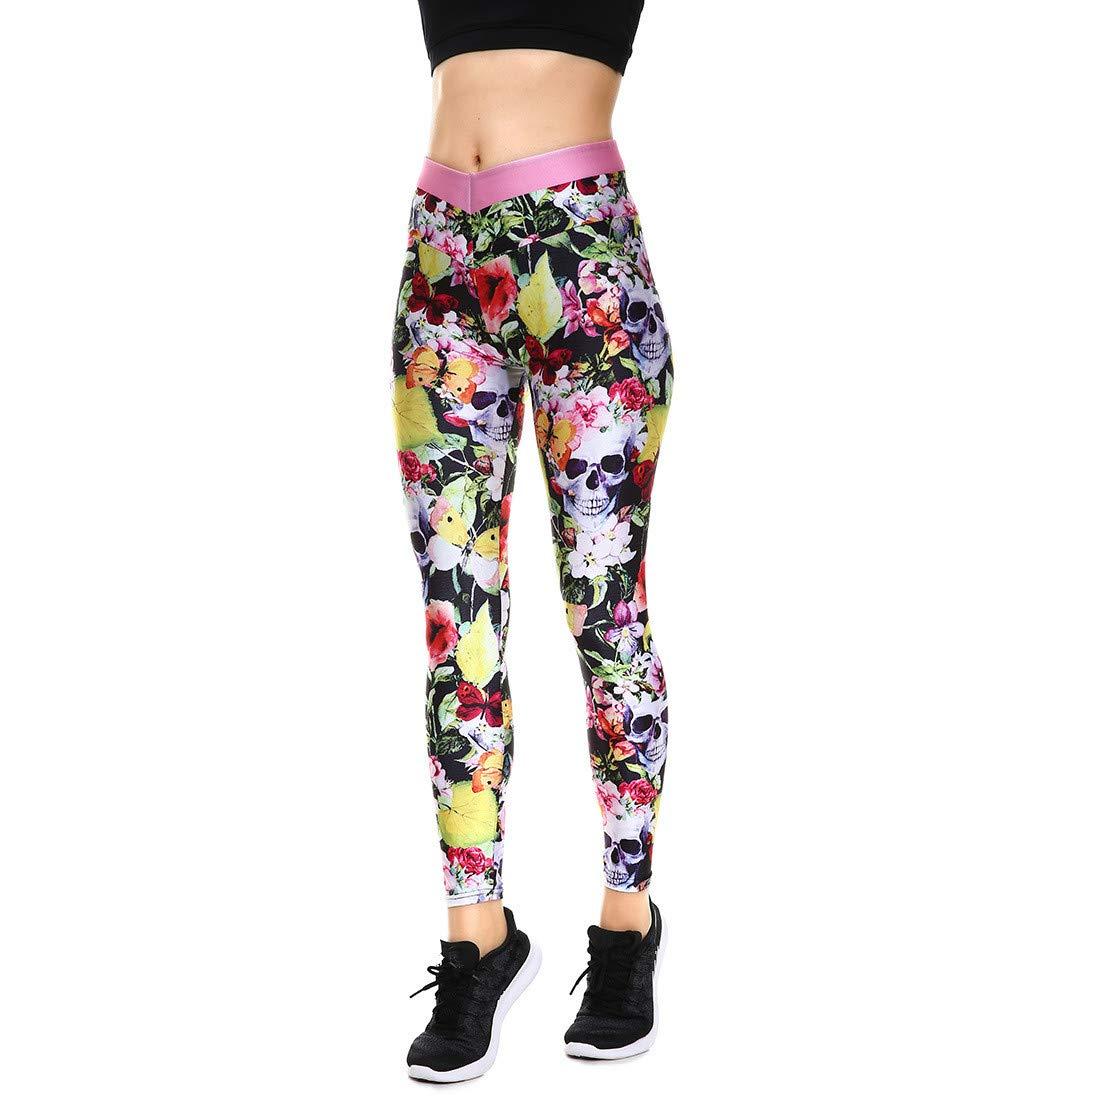 Fanii Quare Women's High Waist Dri-Fit Running Tights Printed Training Compression Workout Pants Leaf Skull S